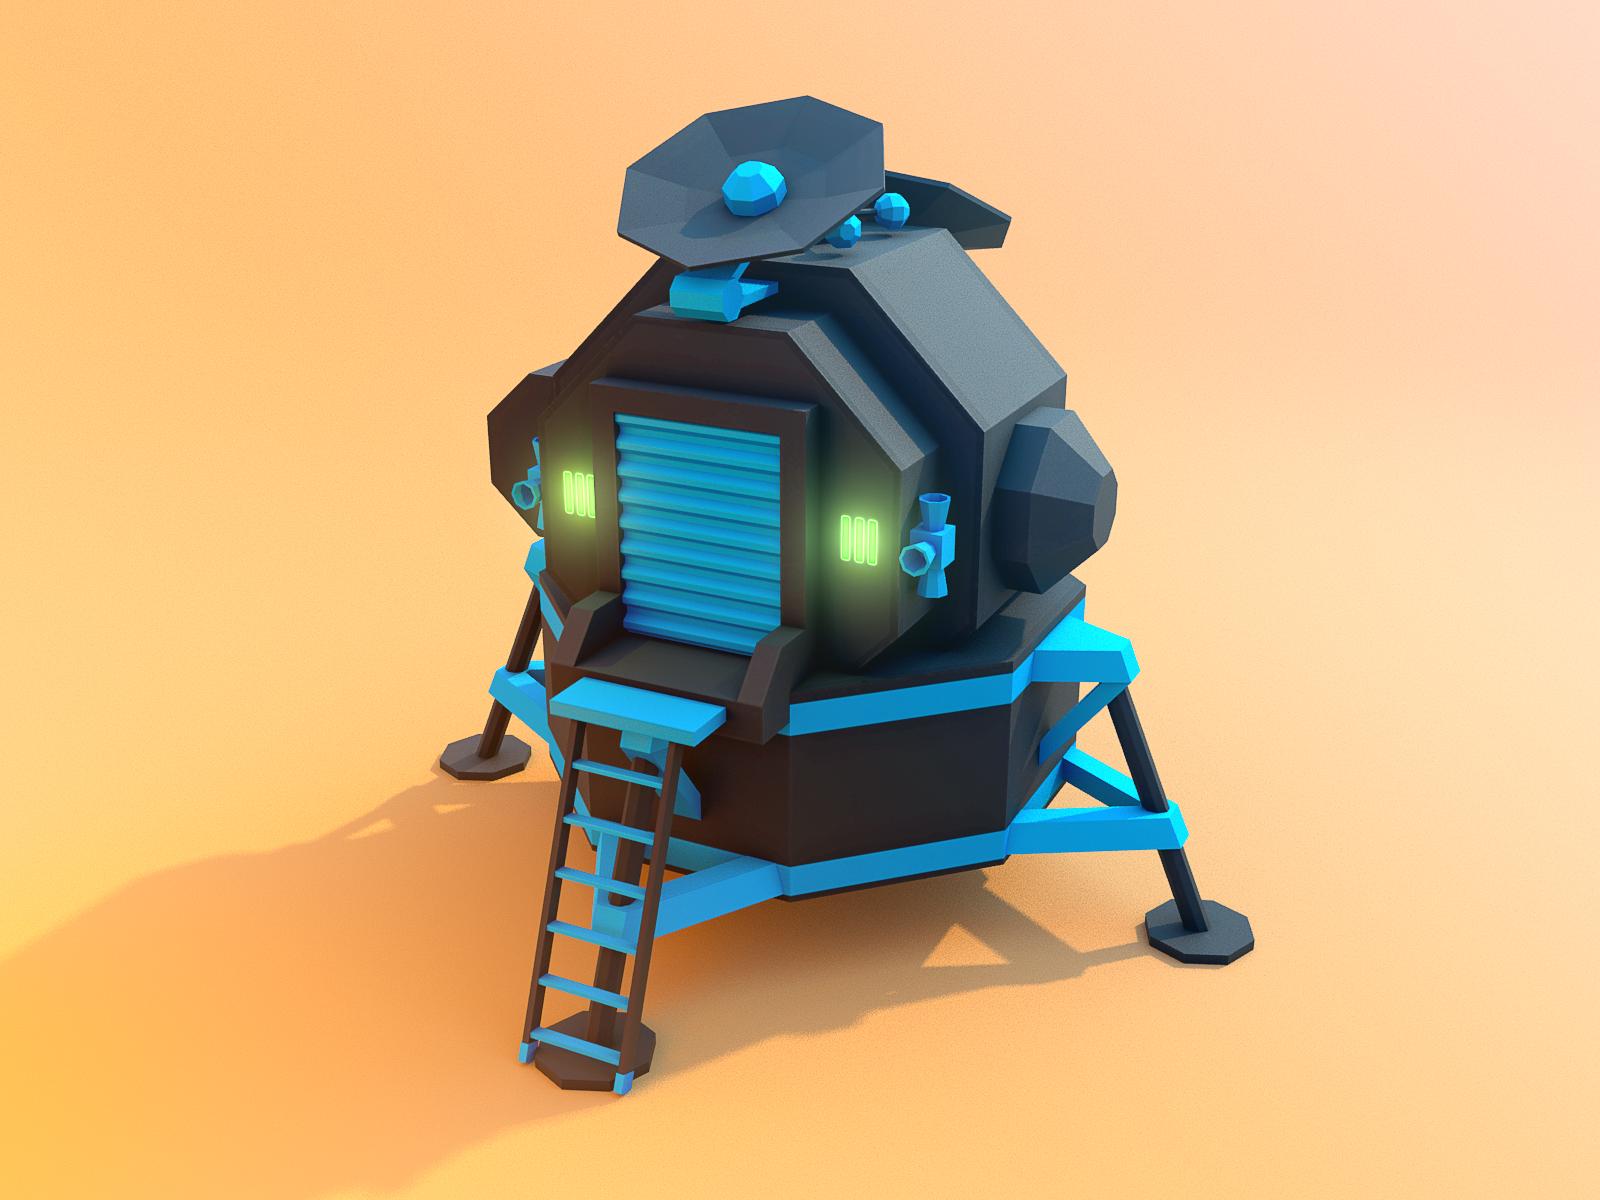 Moonlander render 1 8bits